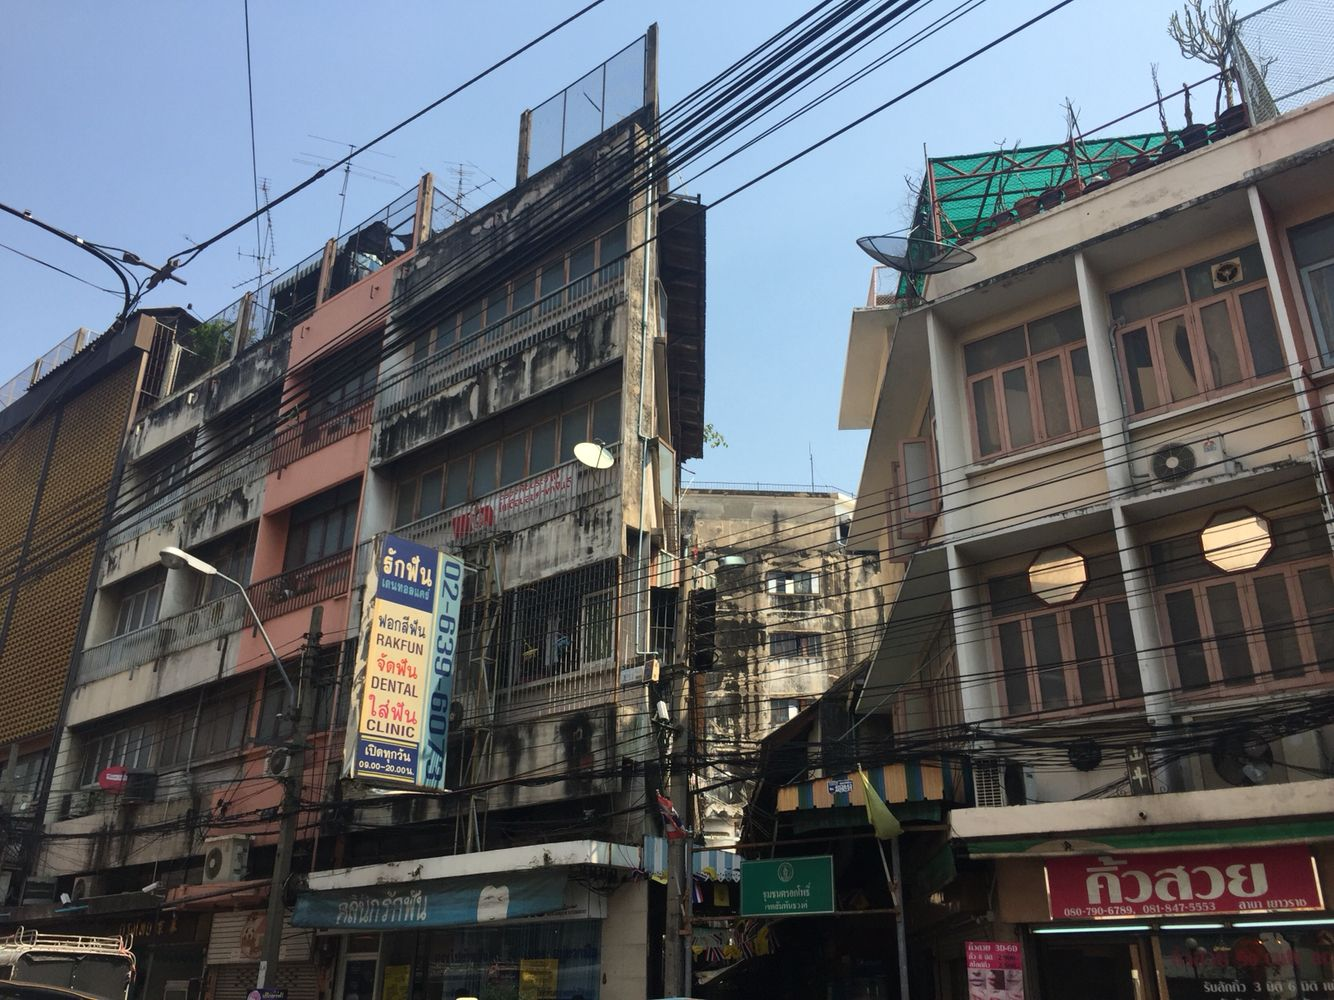 china town architecture bangkok